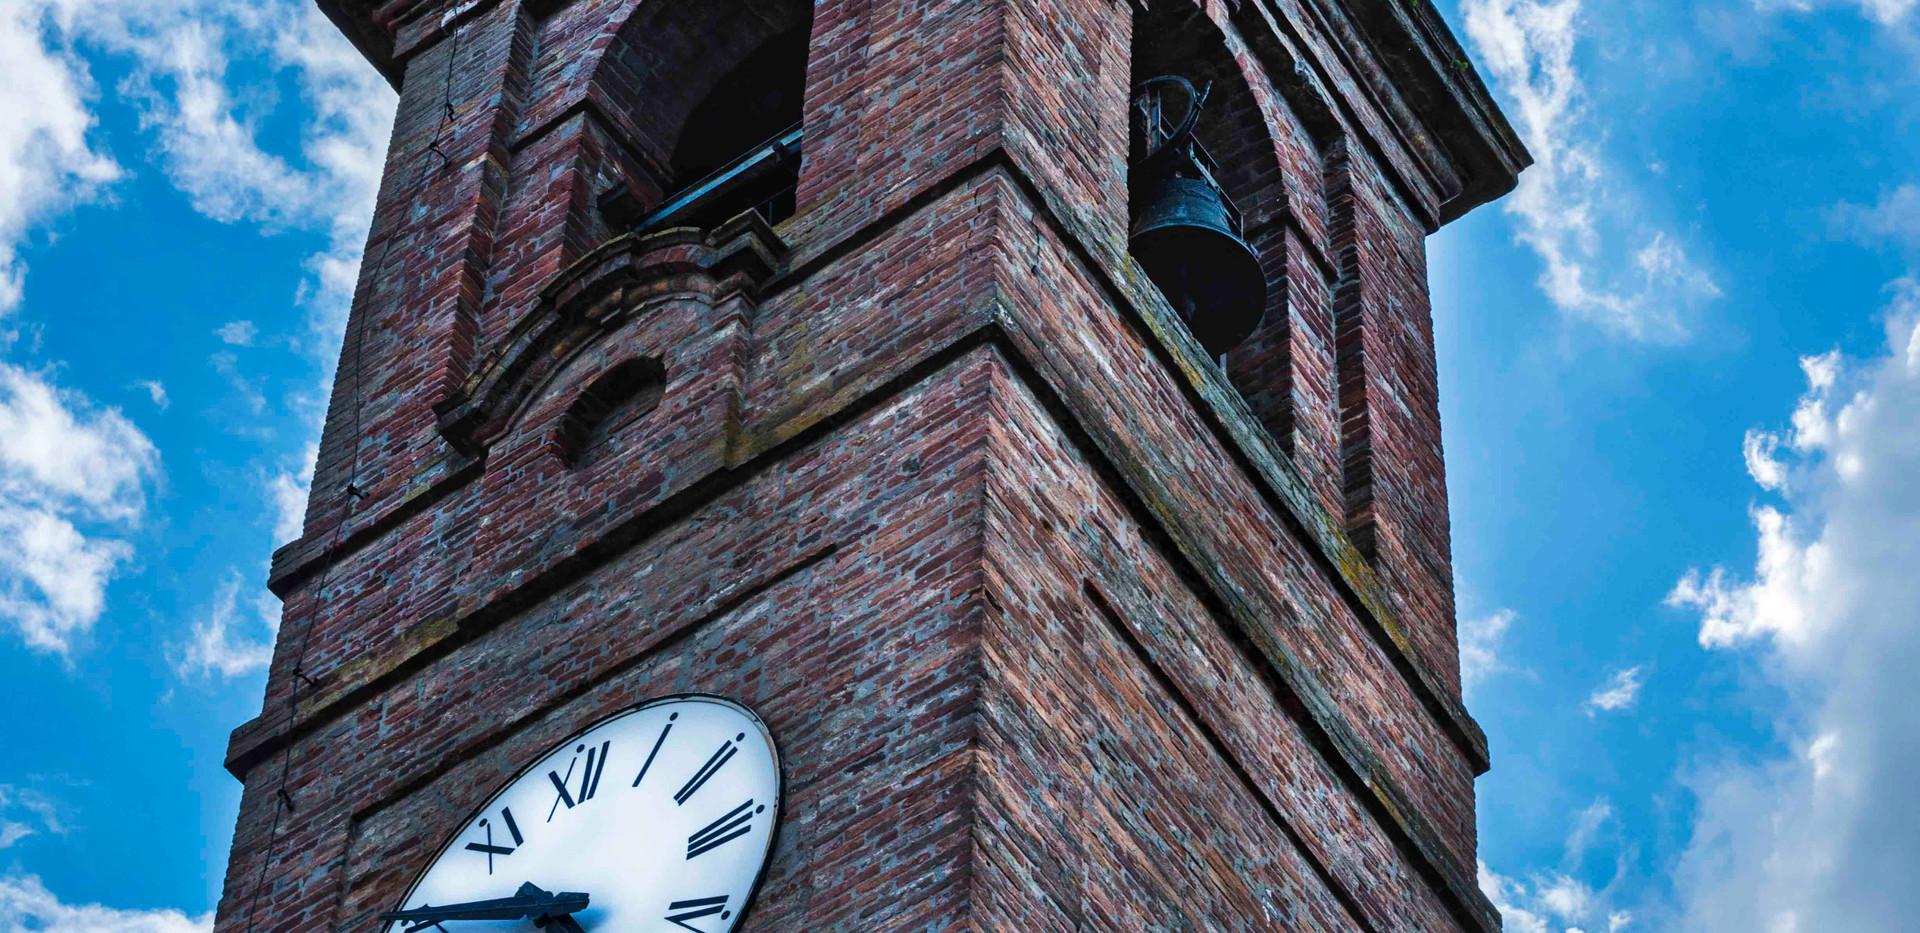 Piegaro clock tower